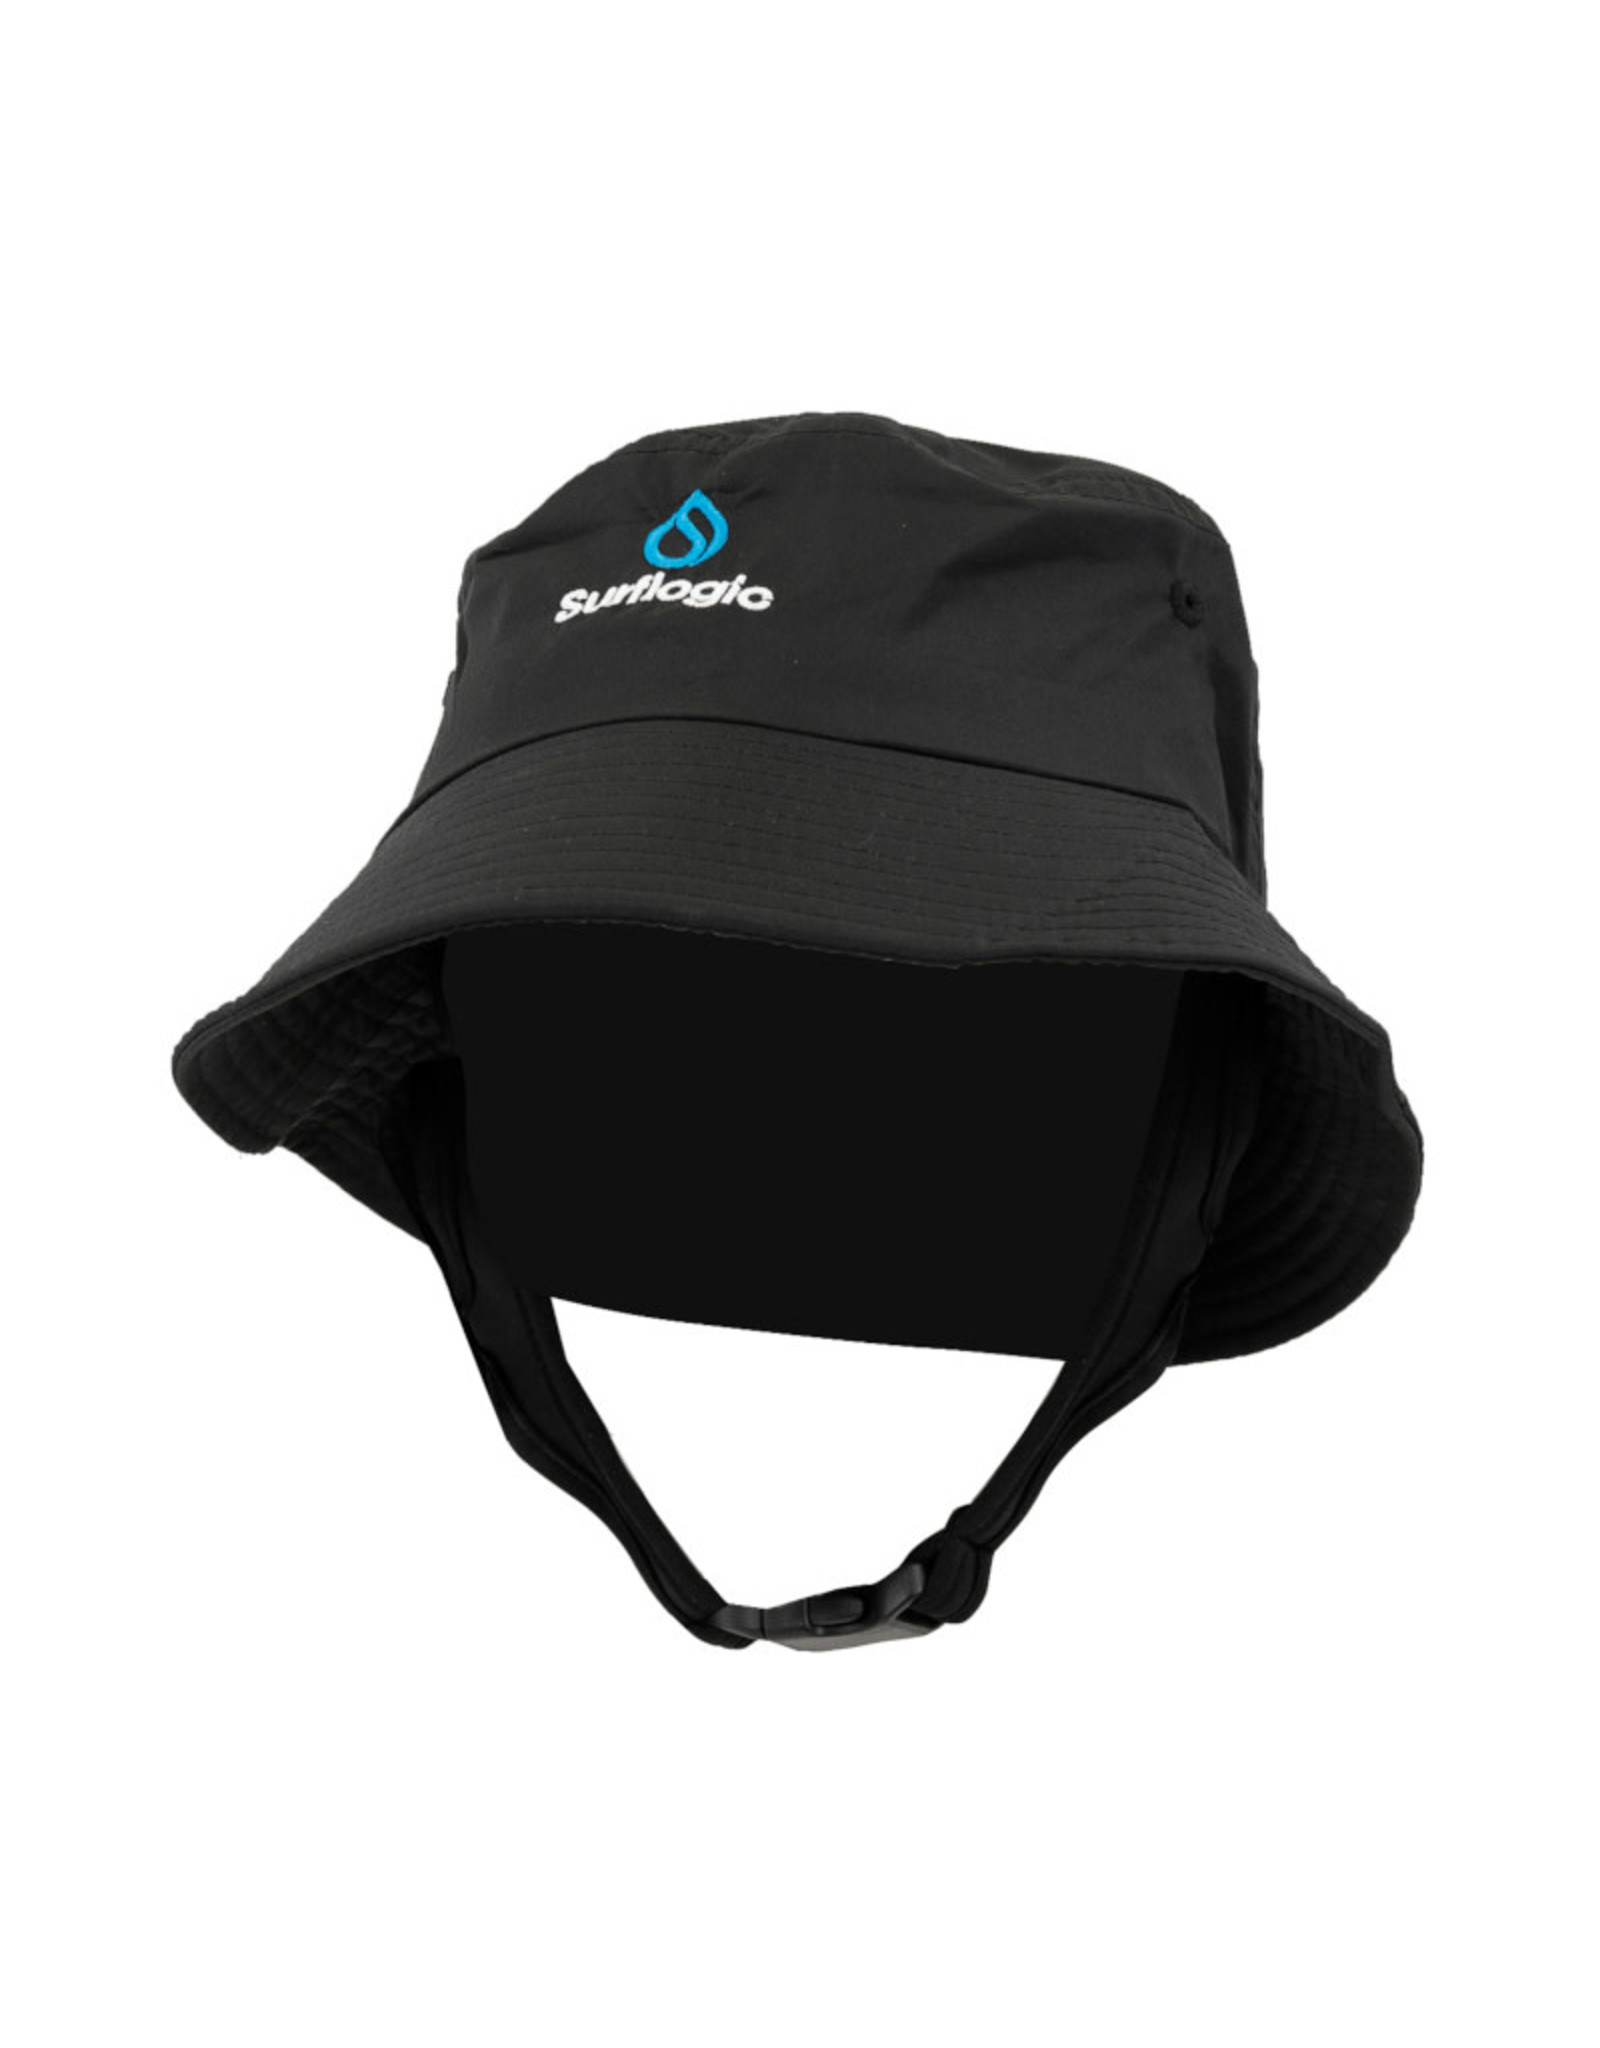 Surflogic Surflogic Water Hat Grey (Junior)